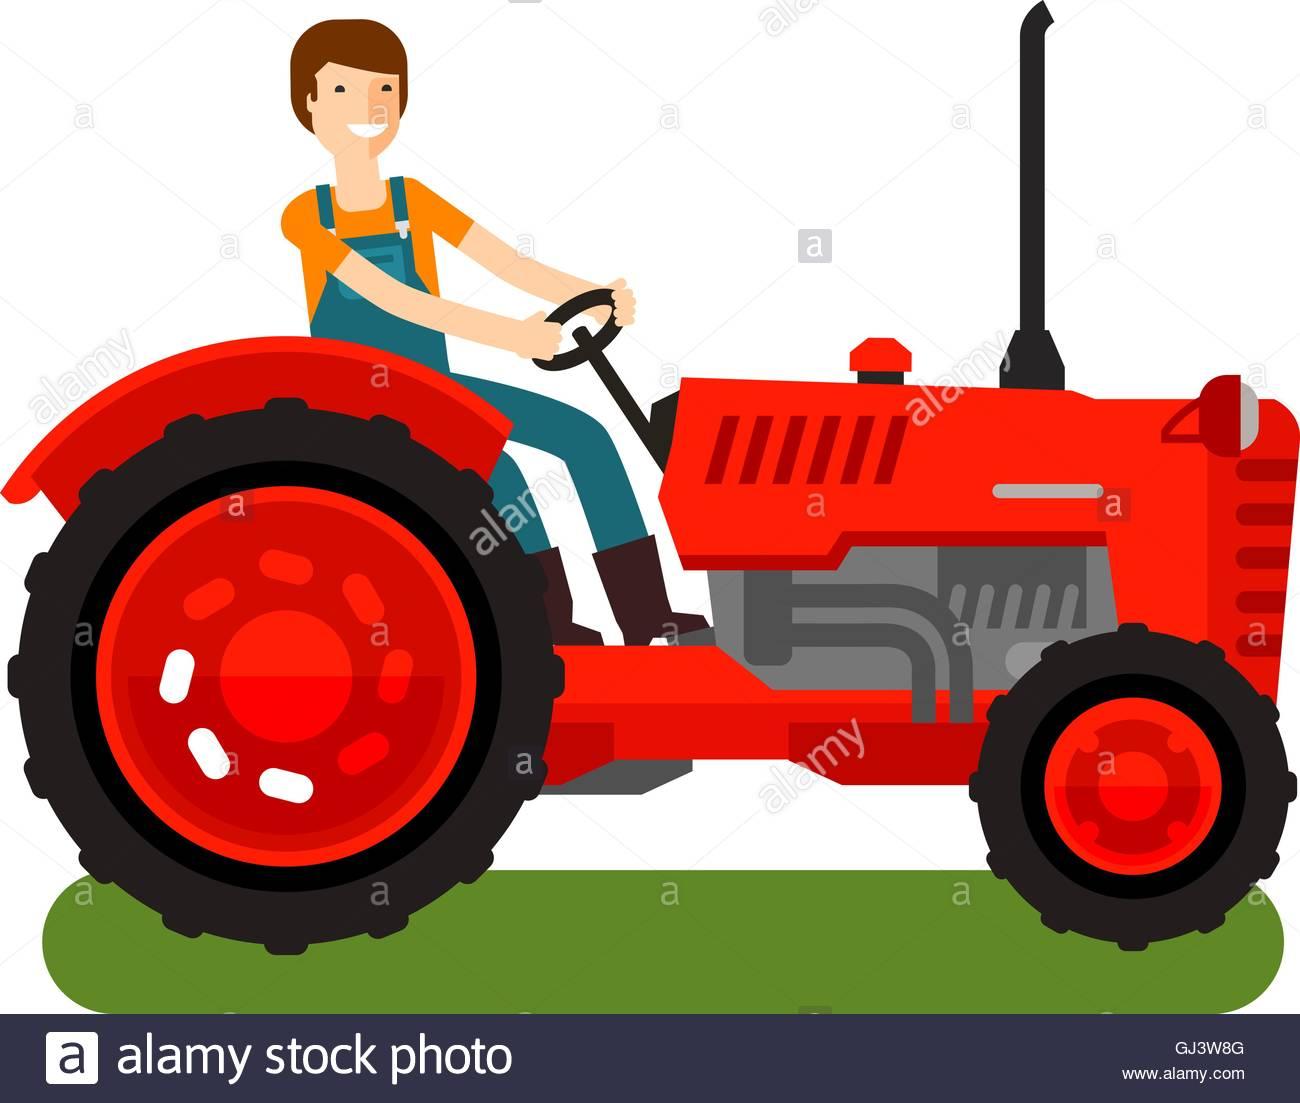 1300x1103 Retro Farm Tractor Icon. Cartoon Vector Illustration Stock Vector